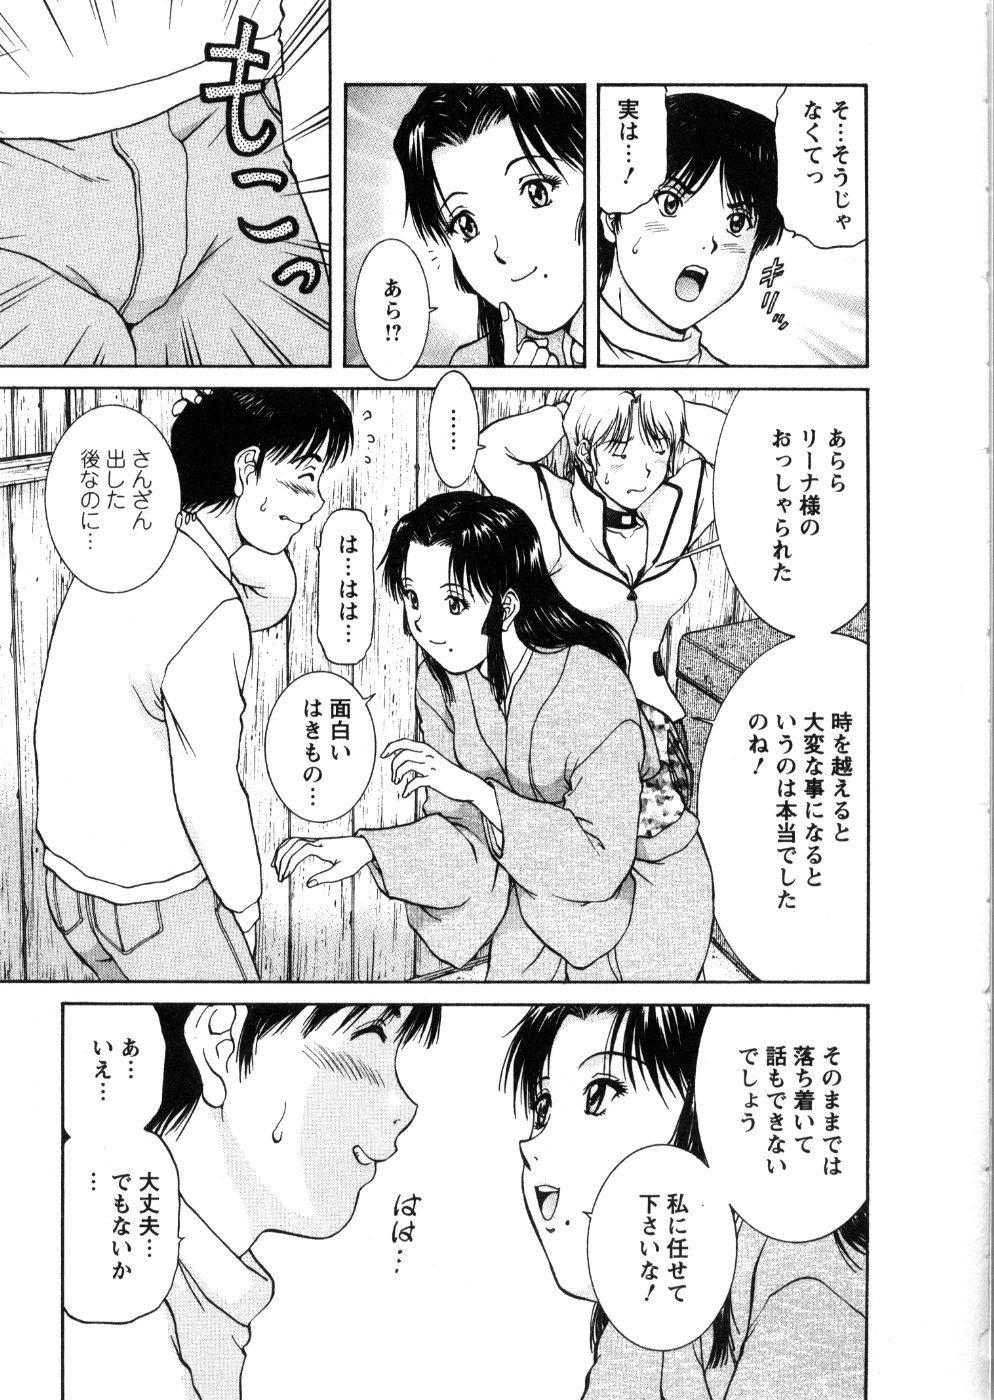 Oneechan-tachi ga Yatte Kuru 03 24